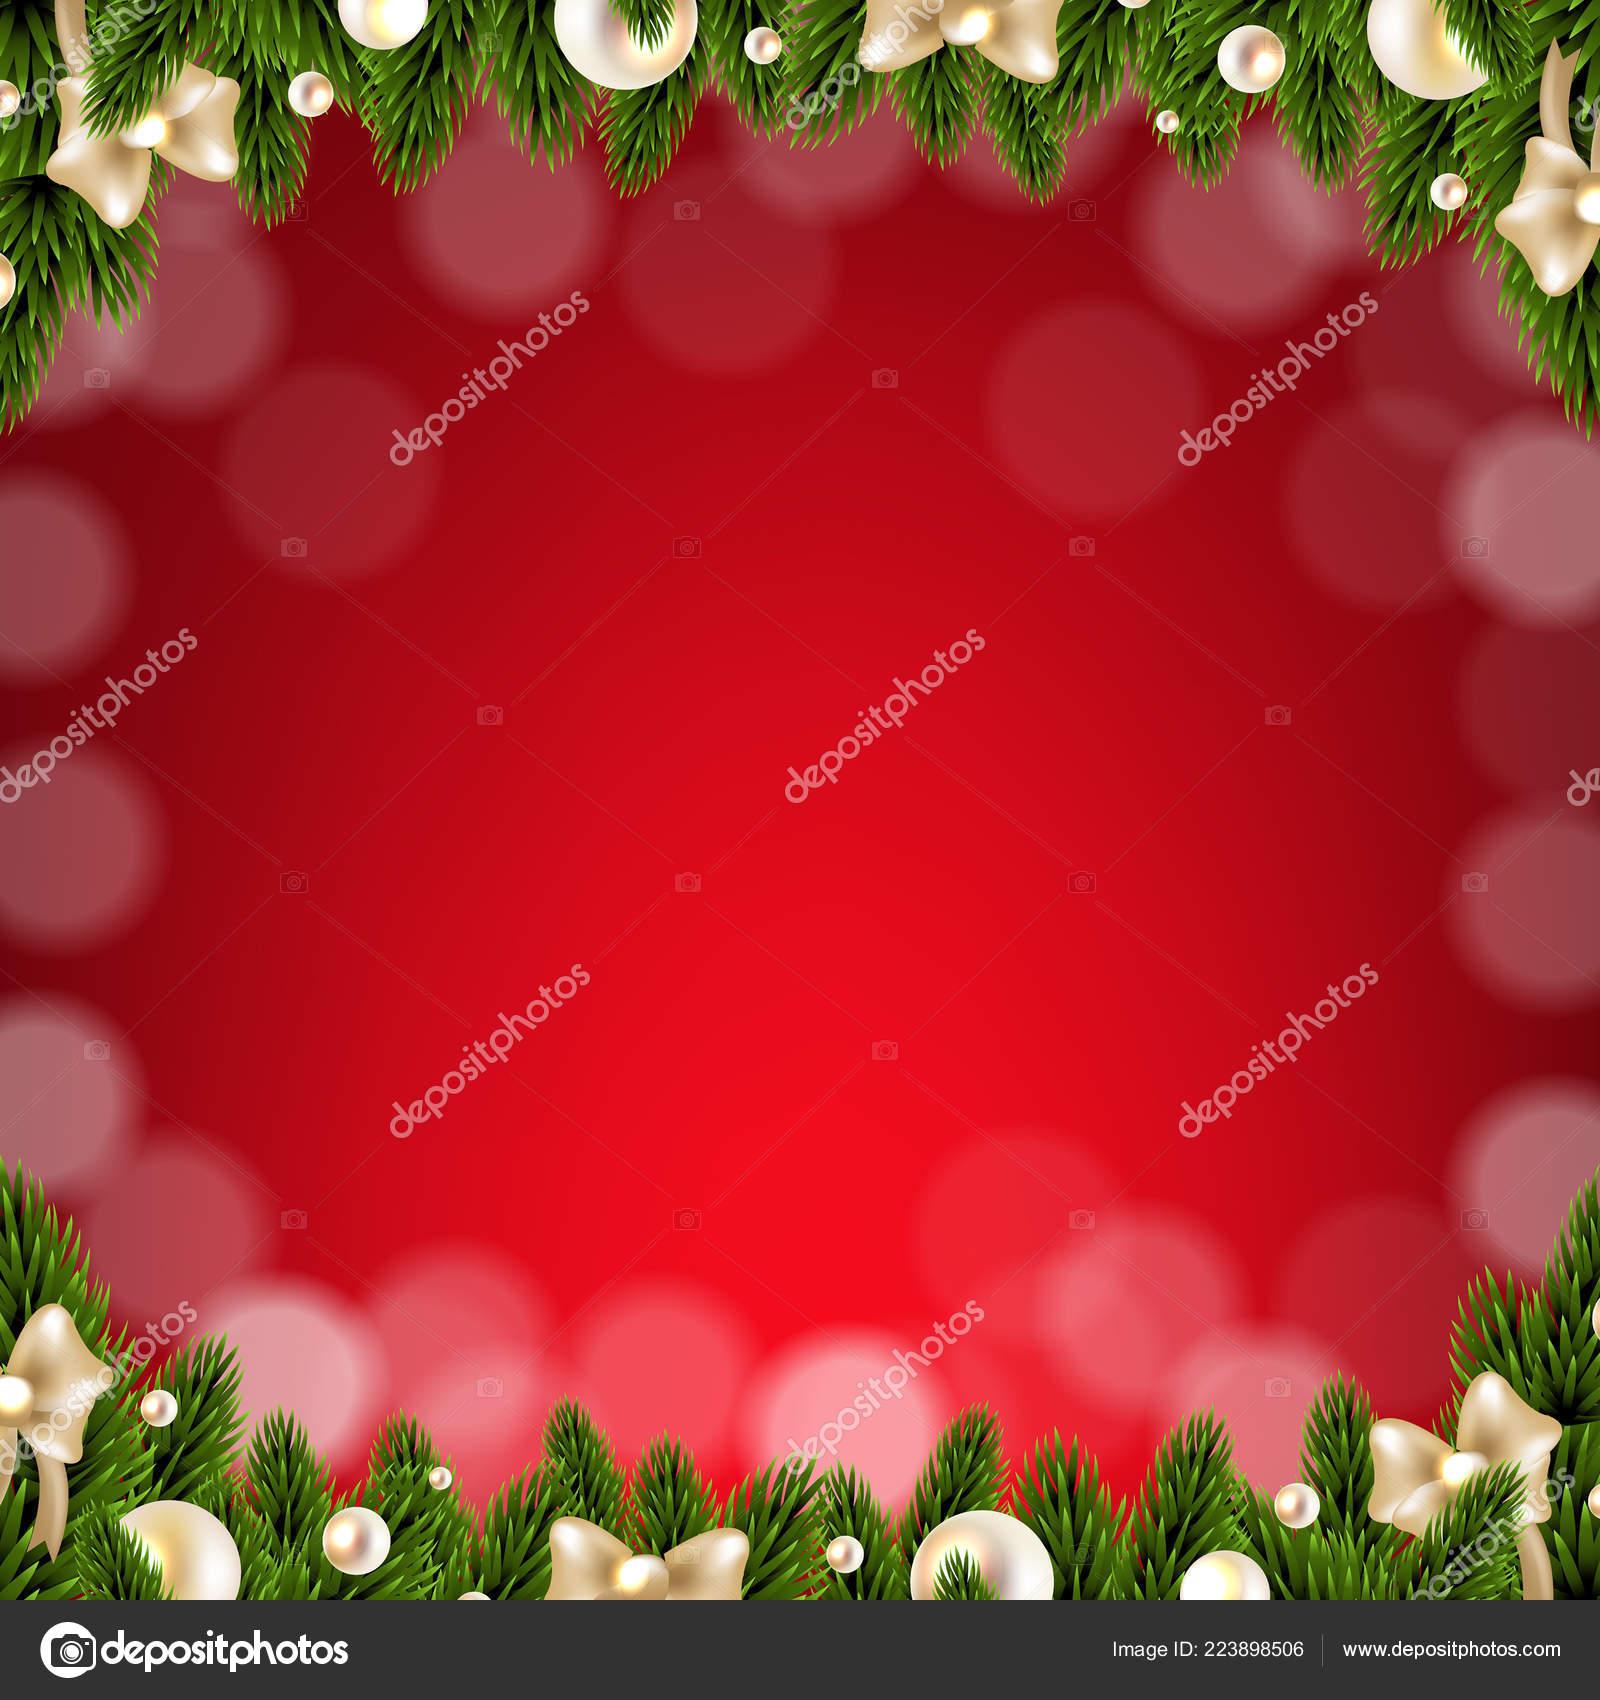 Christmas Card Border Gradient Mesh Vector Illustration Stock Vector C Adamson 223898506